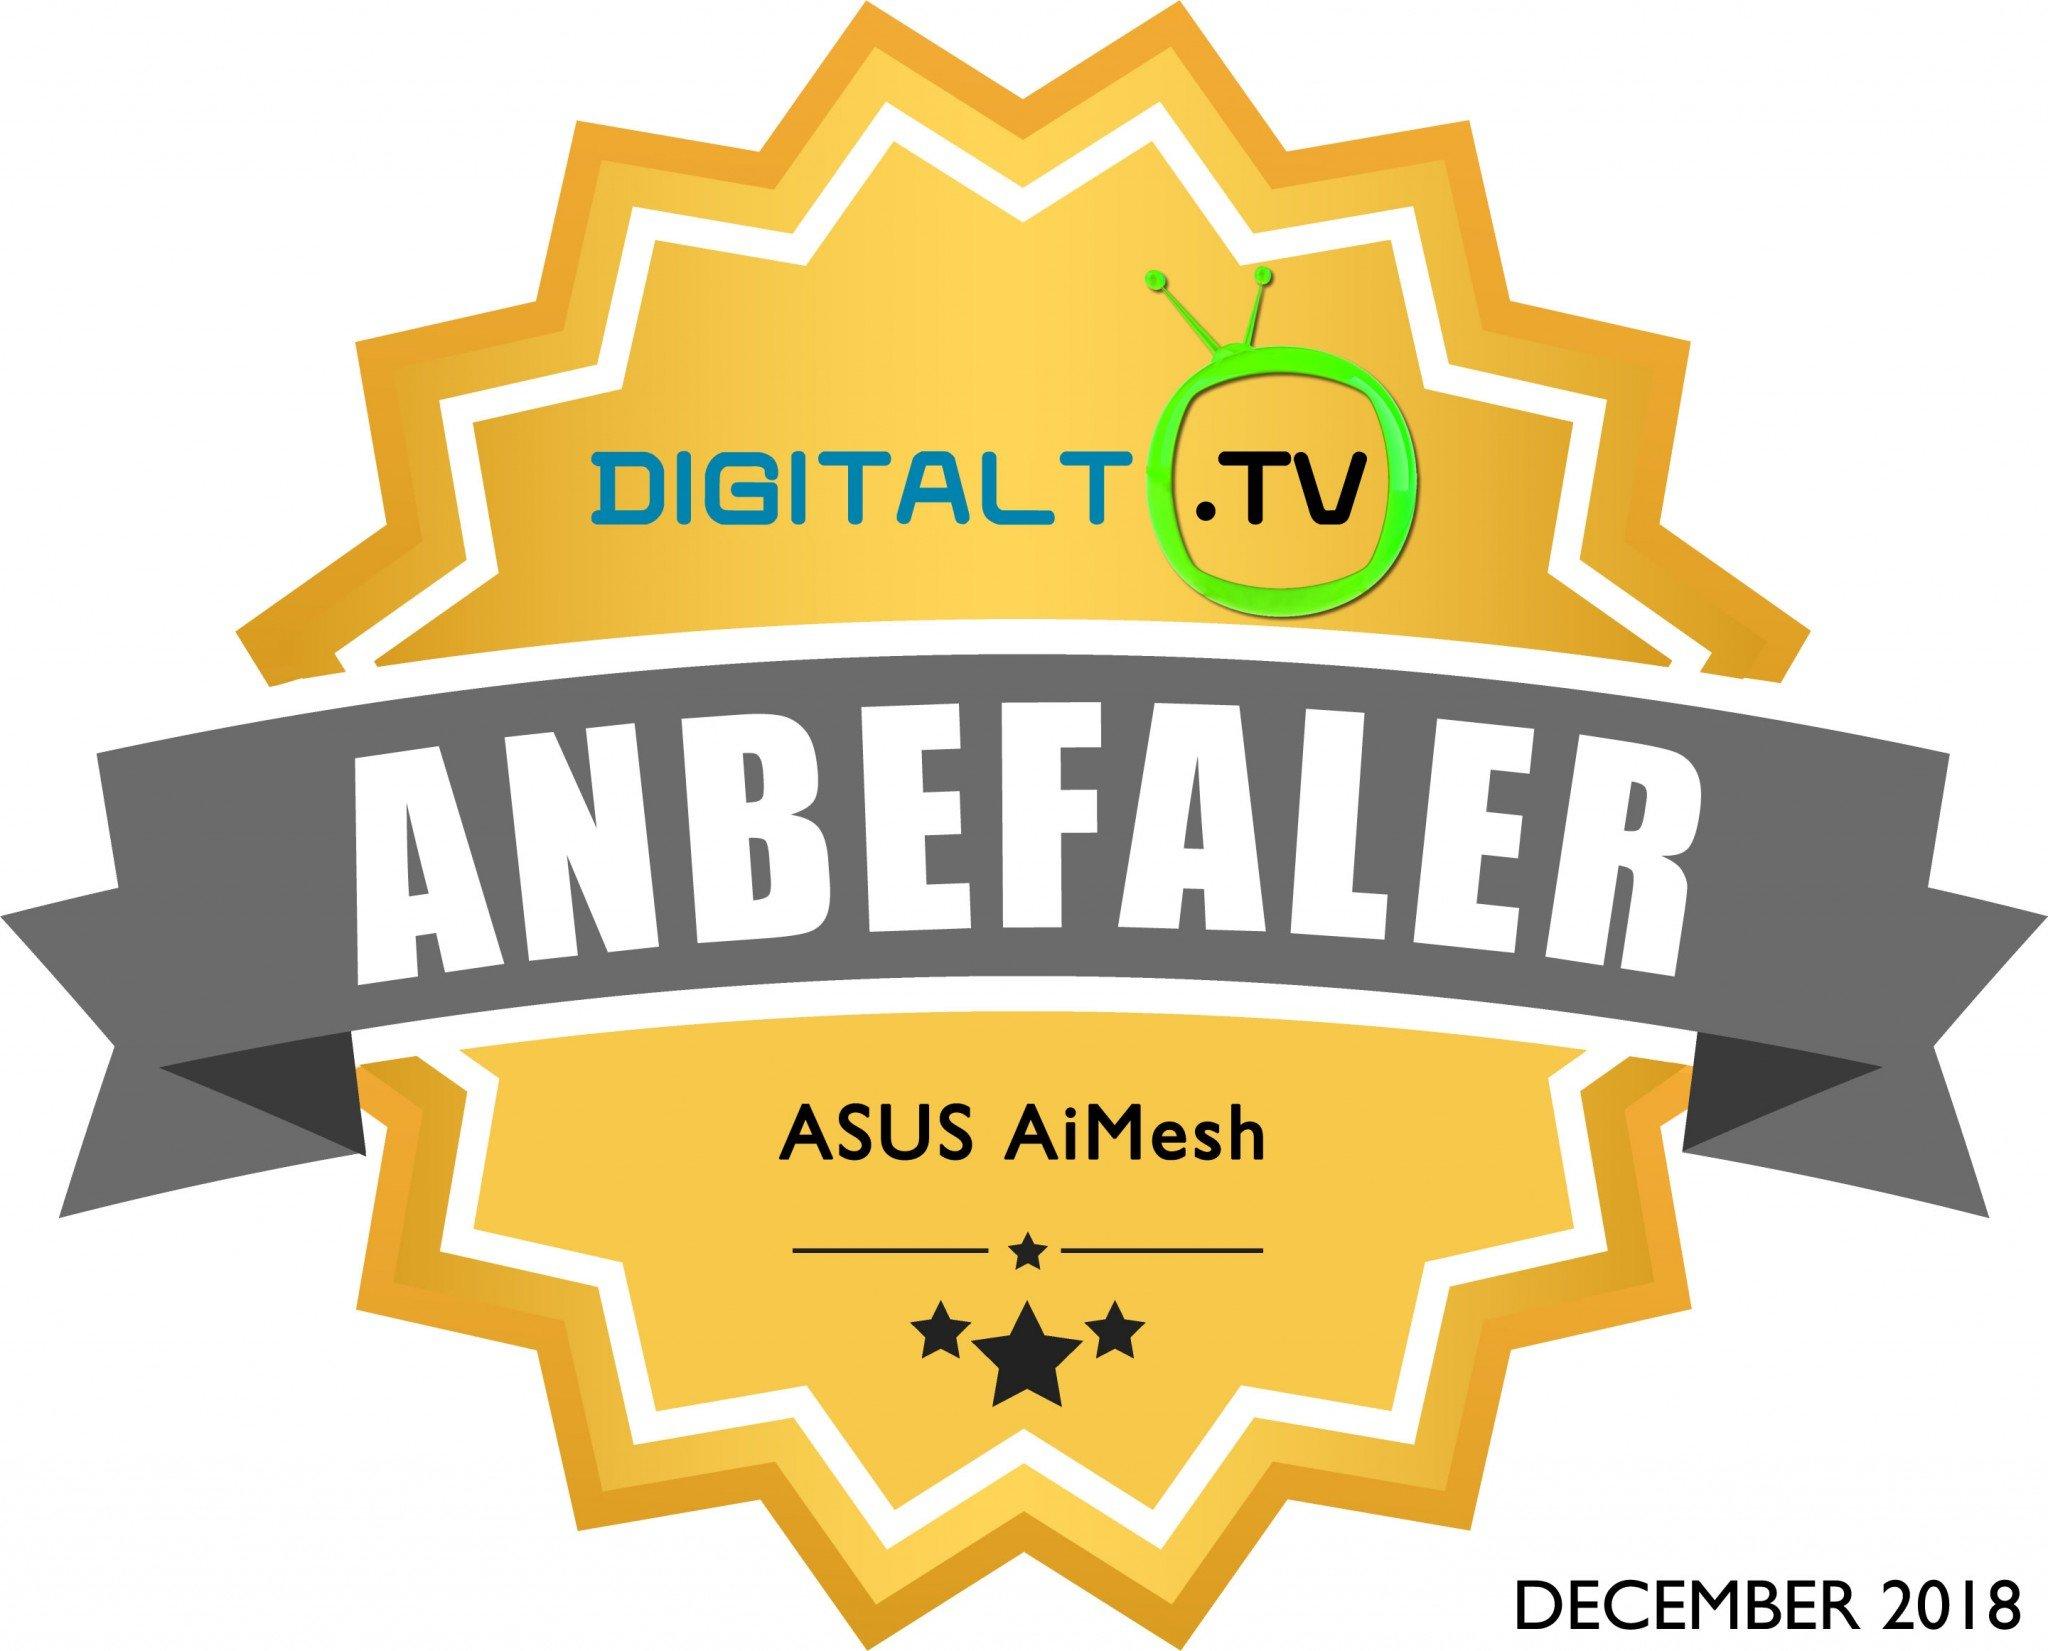 Asus AiMesh Logo anbefaling